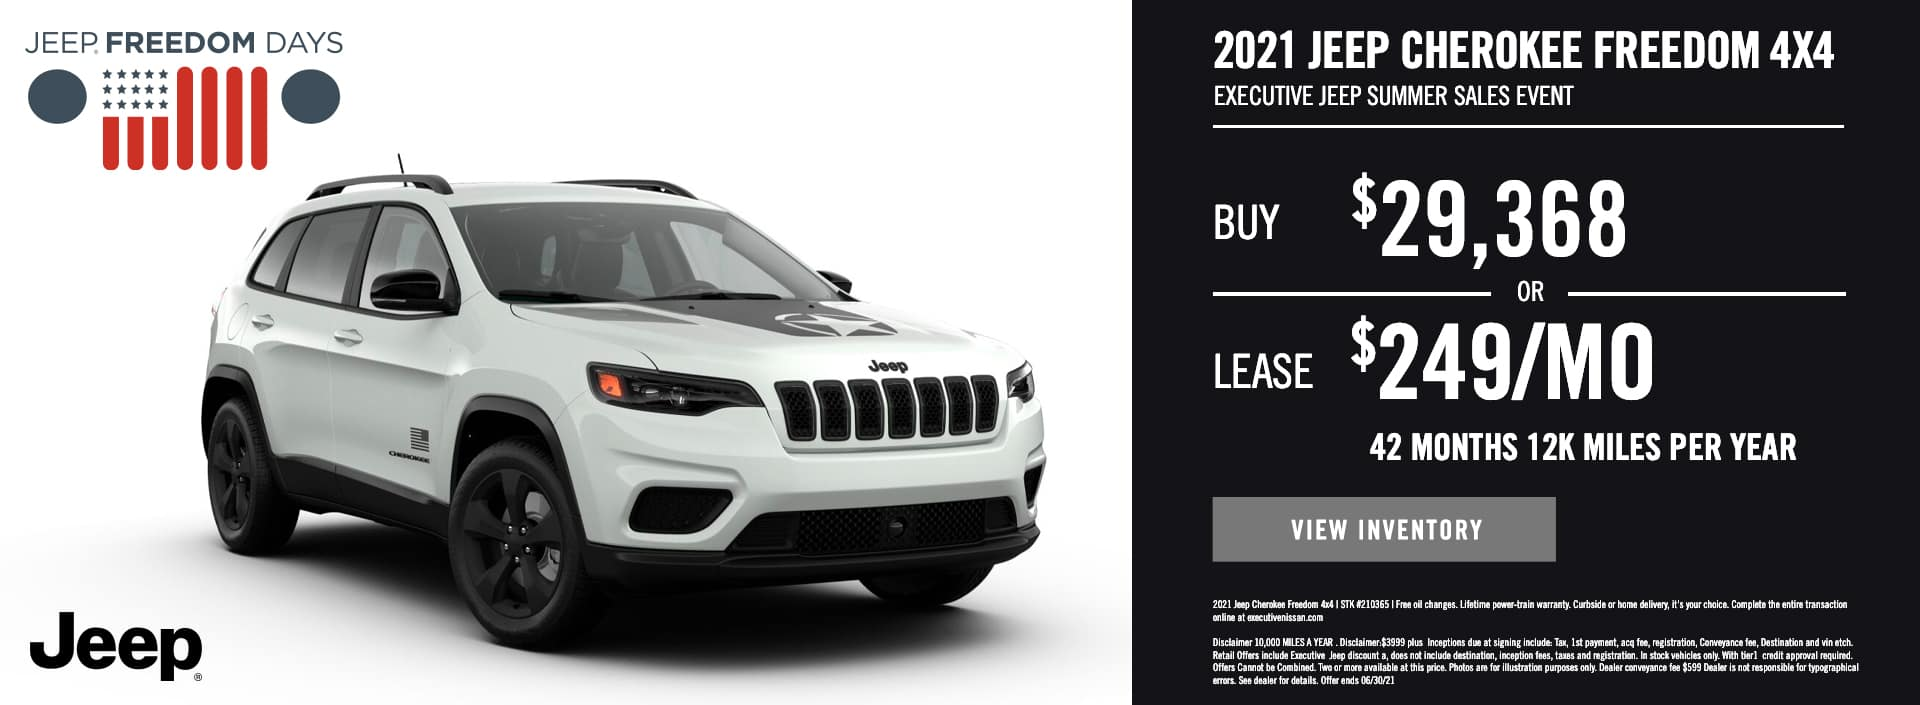 EAG_Jeep_2021 Jeep Cherokee Freedom 4×4